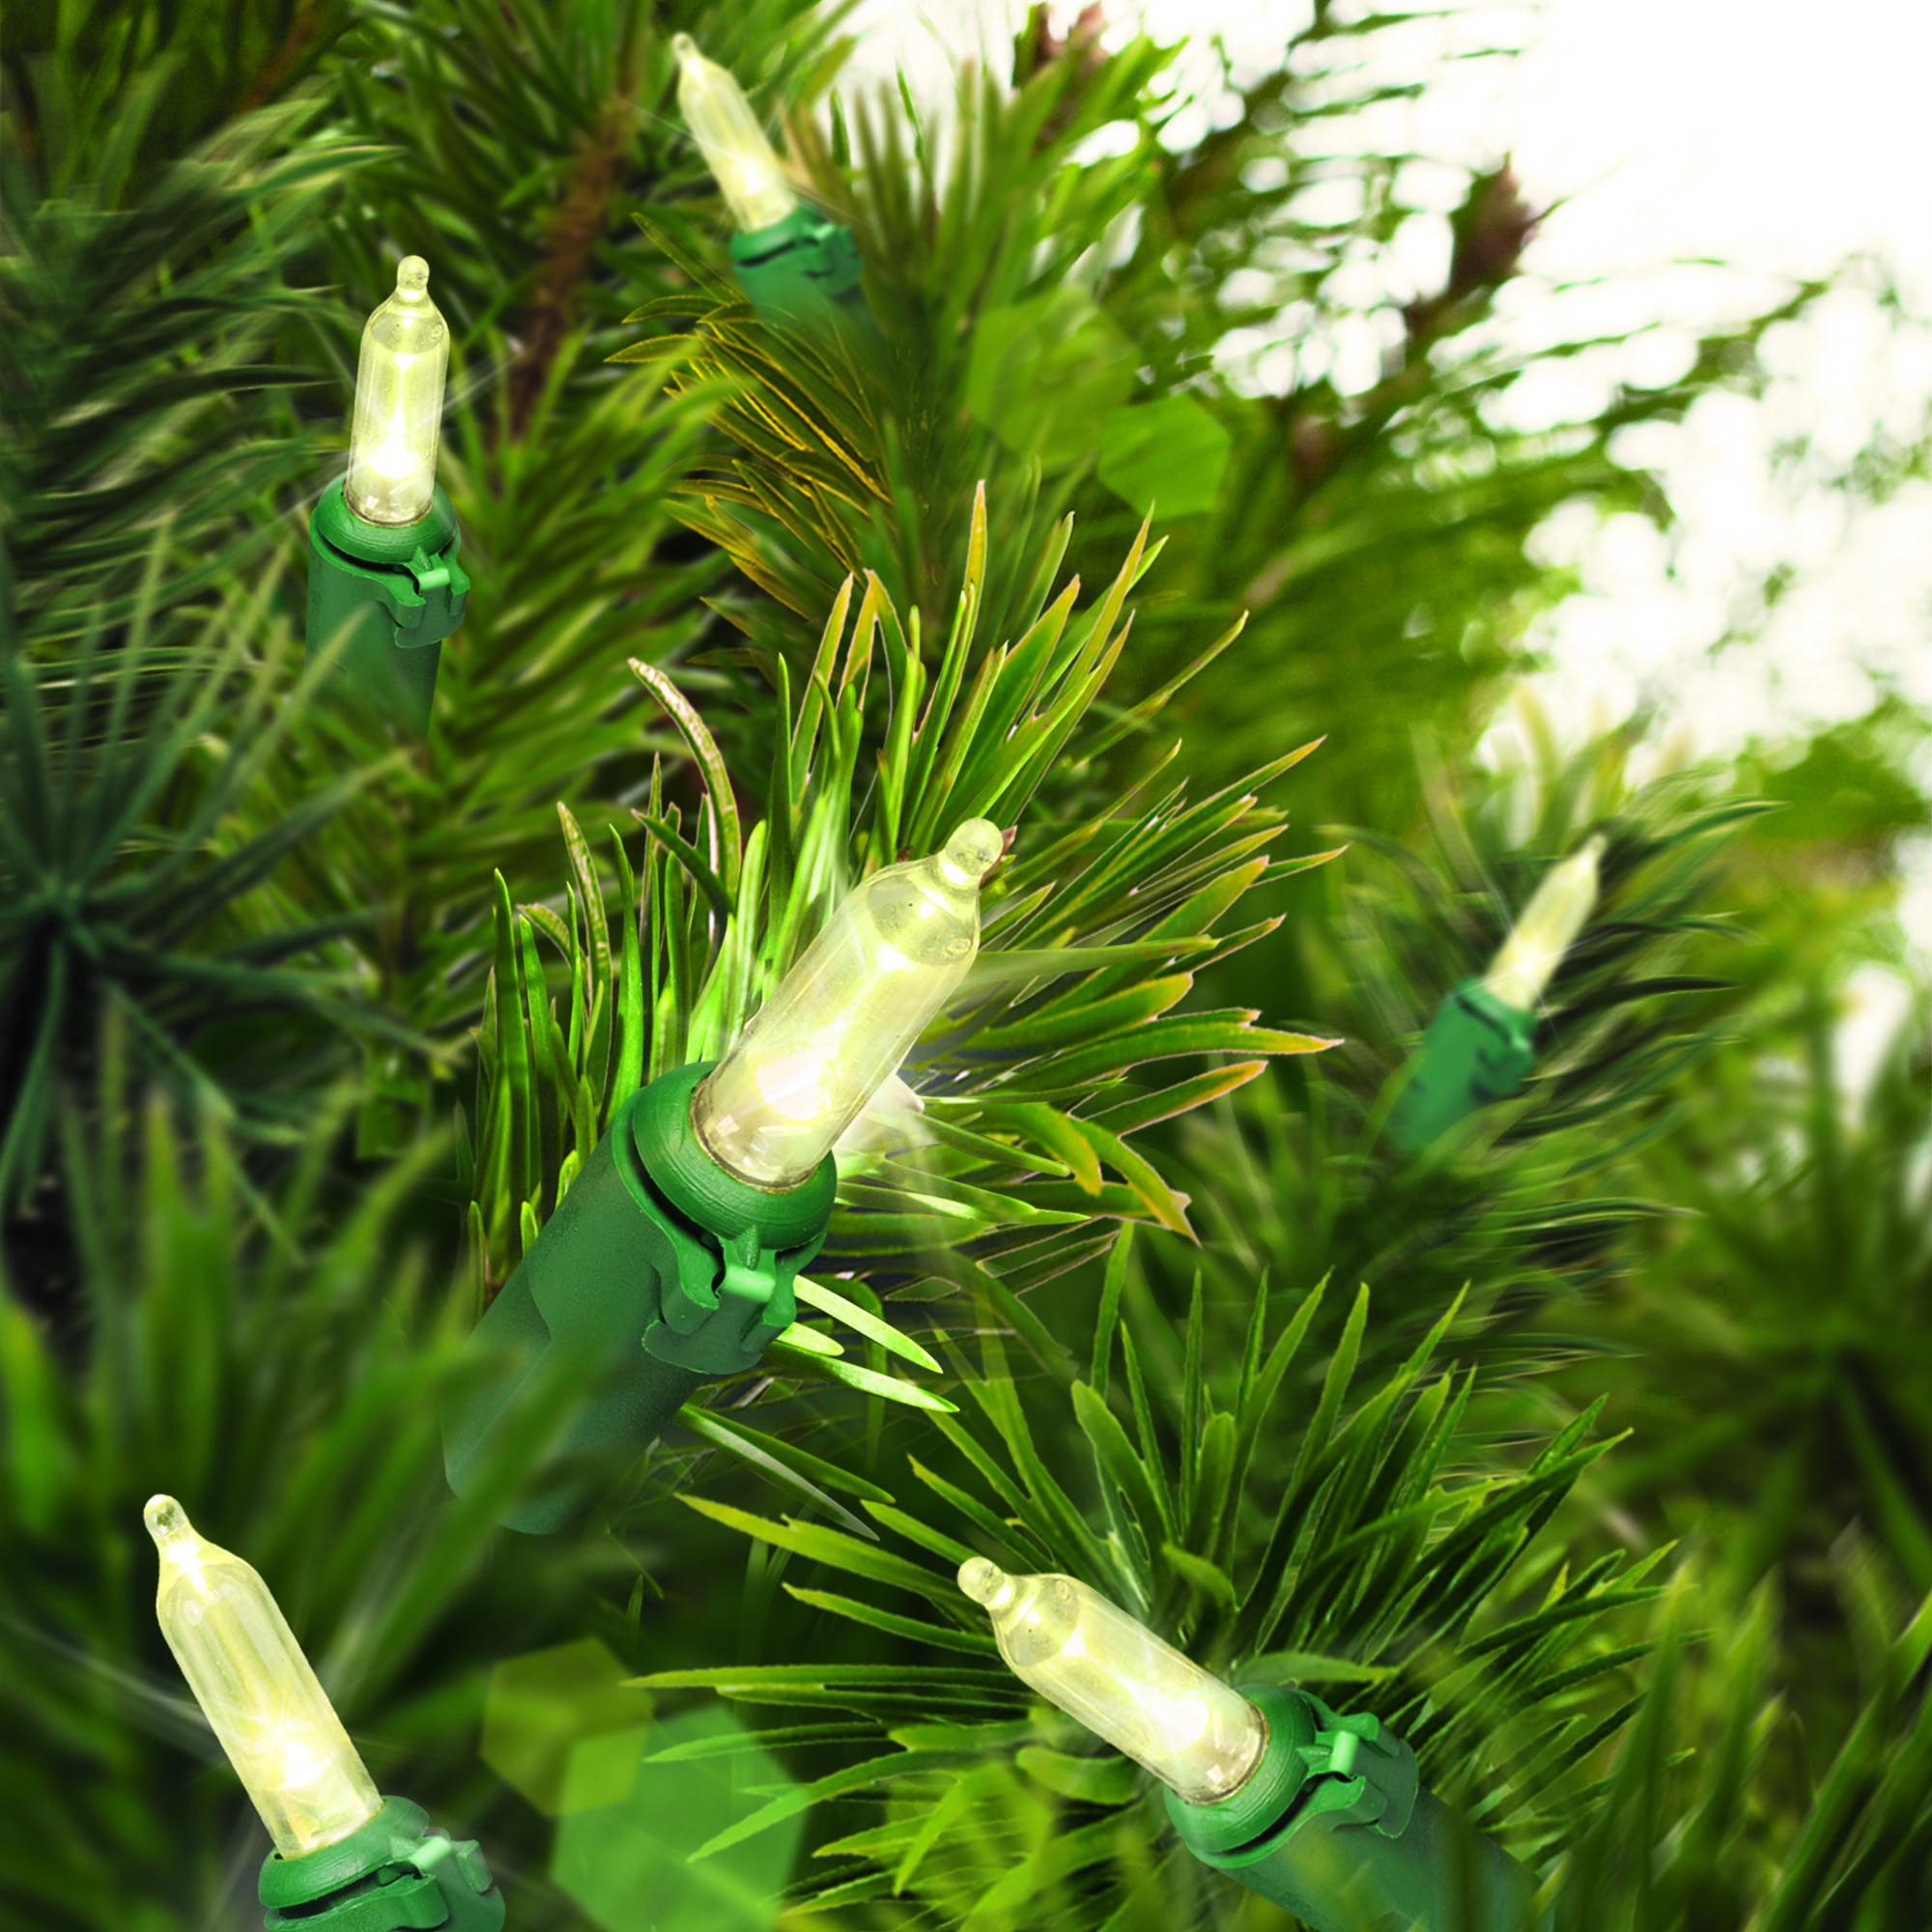 Holiday Time Christmas Wedding Lights  50 Led Warm White Mini Lights Green Wire